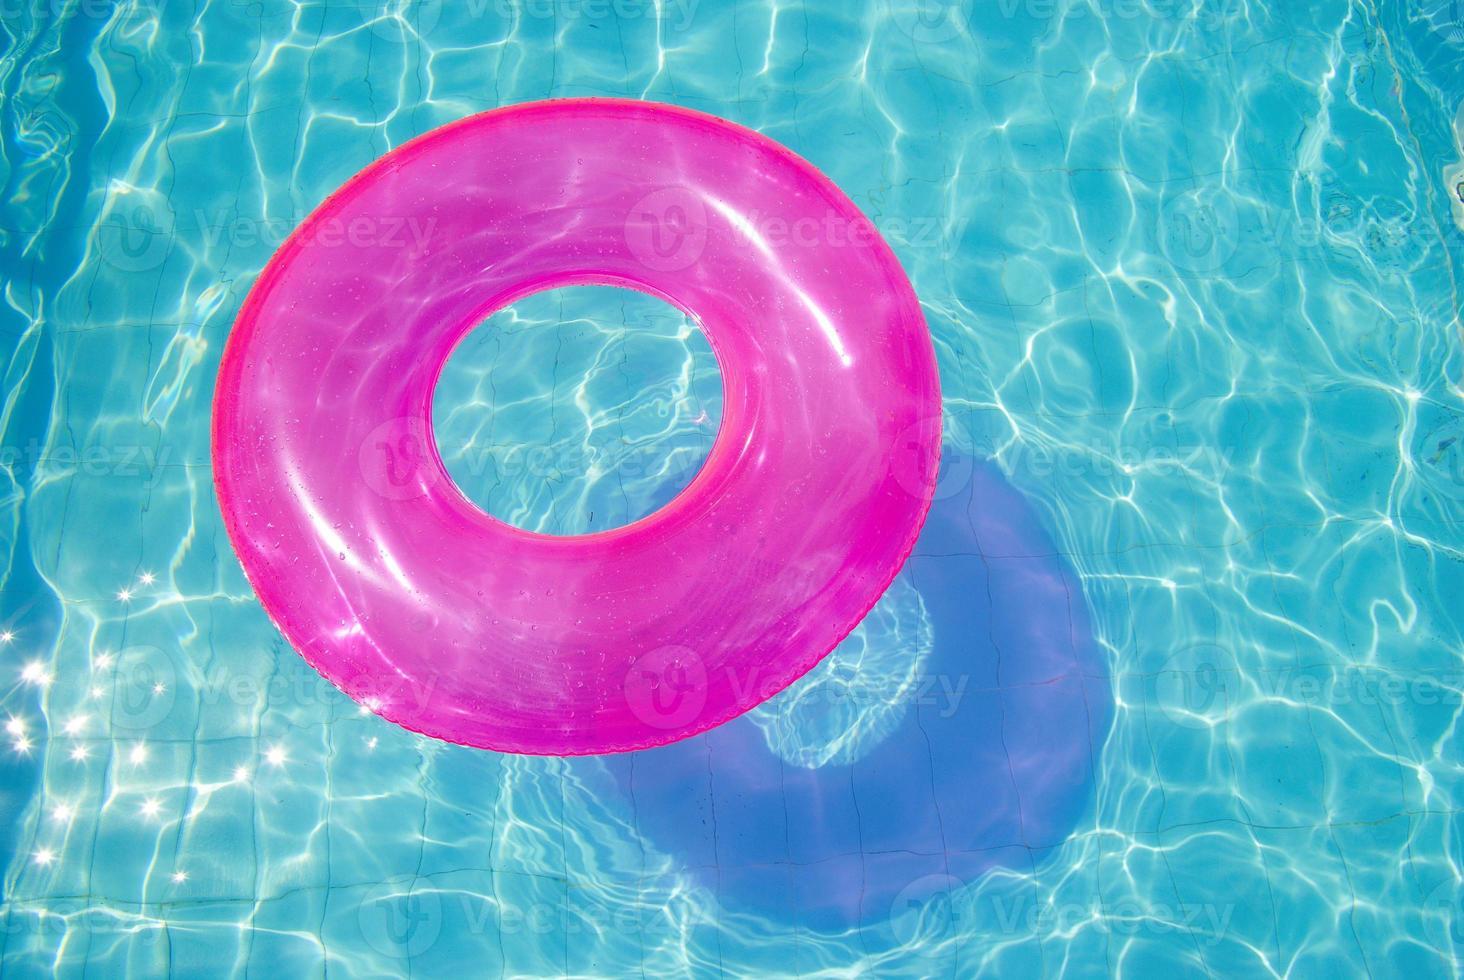 anel de borracha na piscina foto